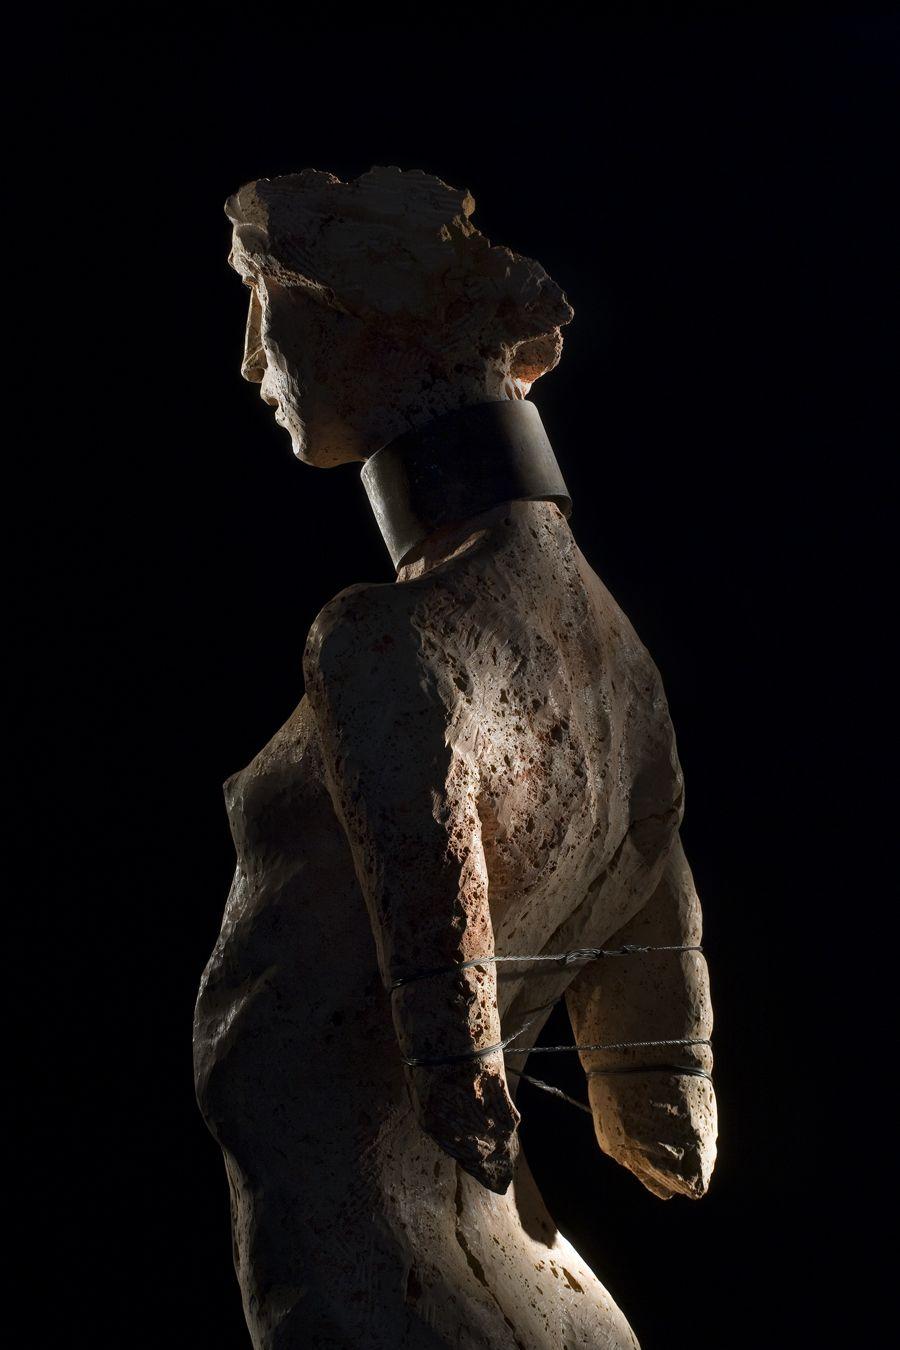 brown - woman - figurative sculpture - Christian Zucconi